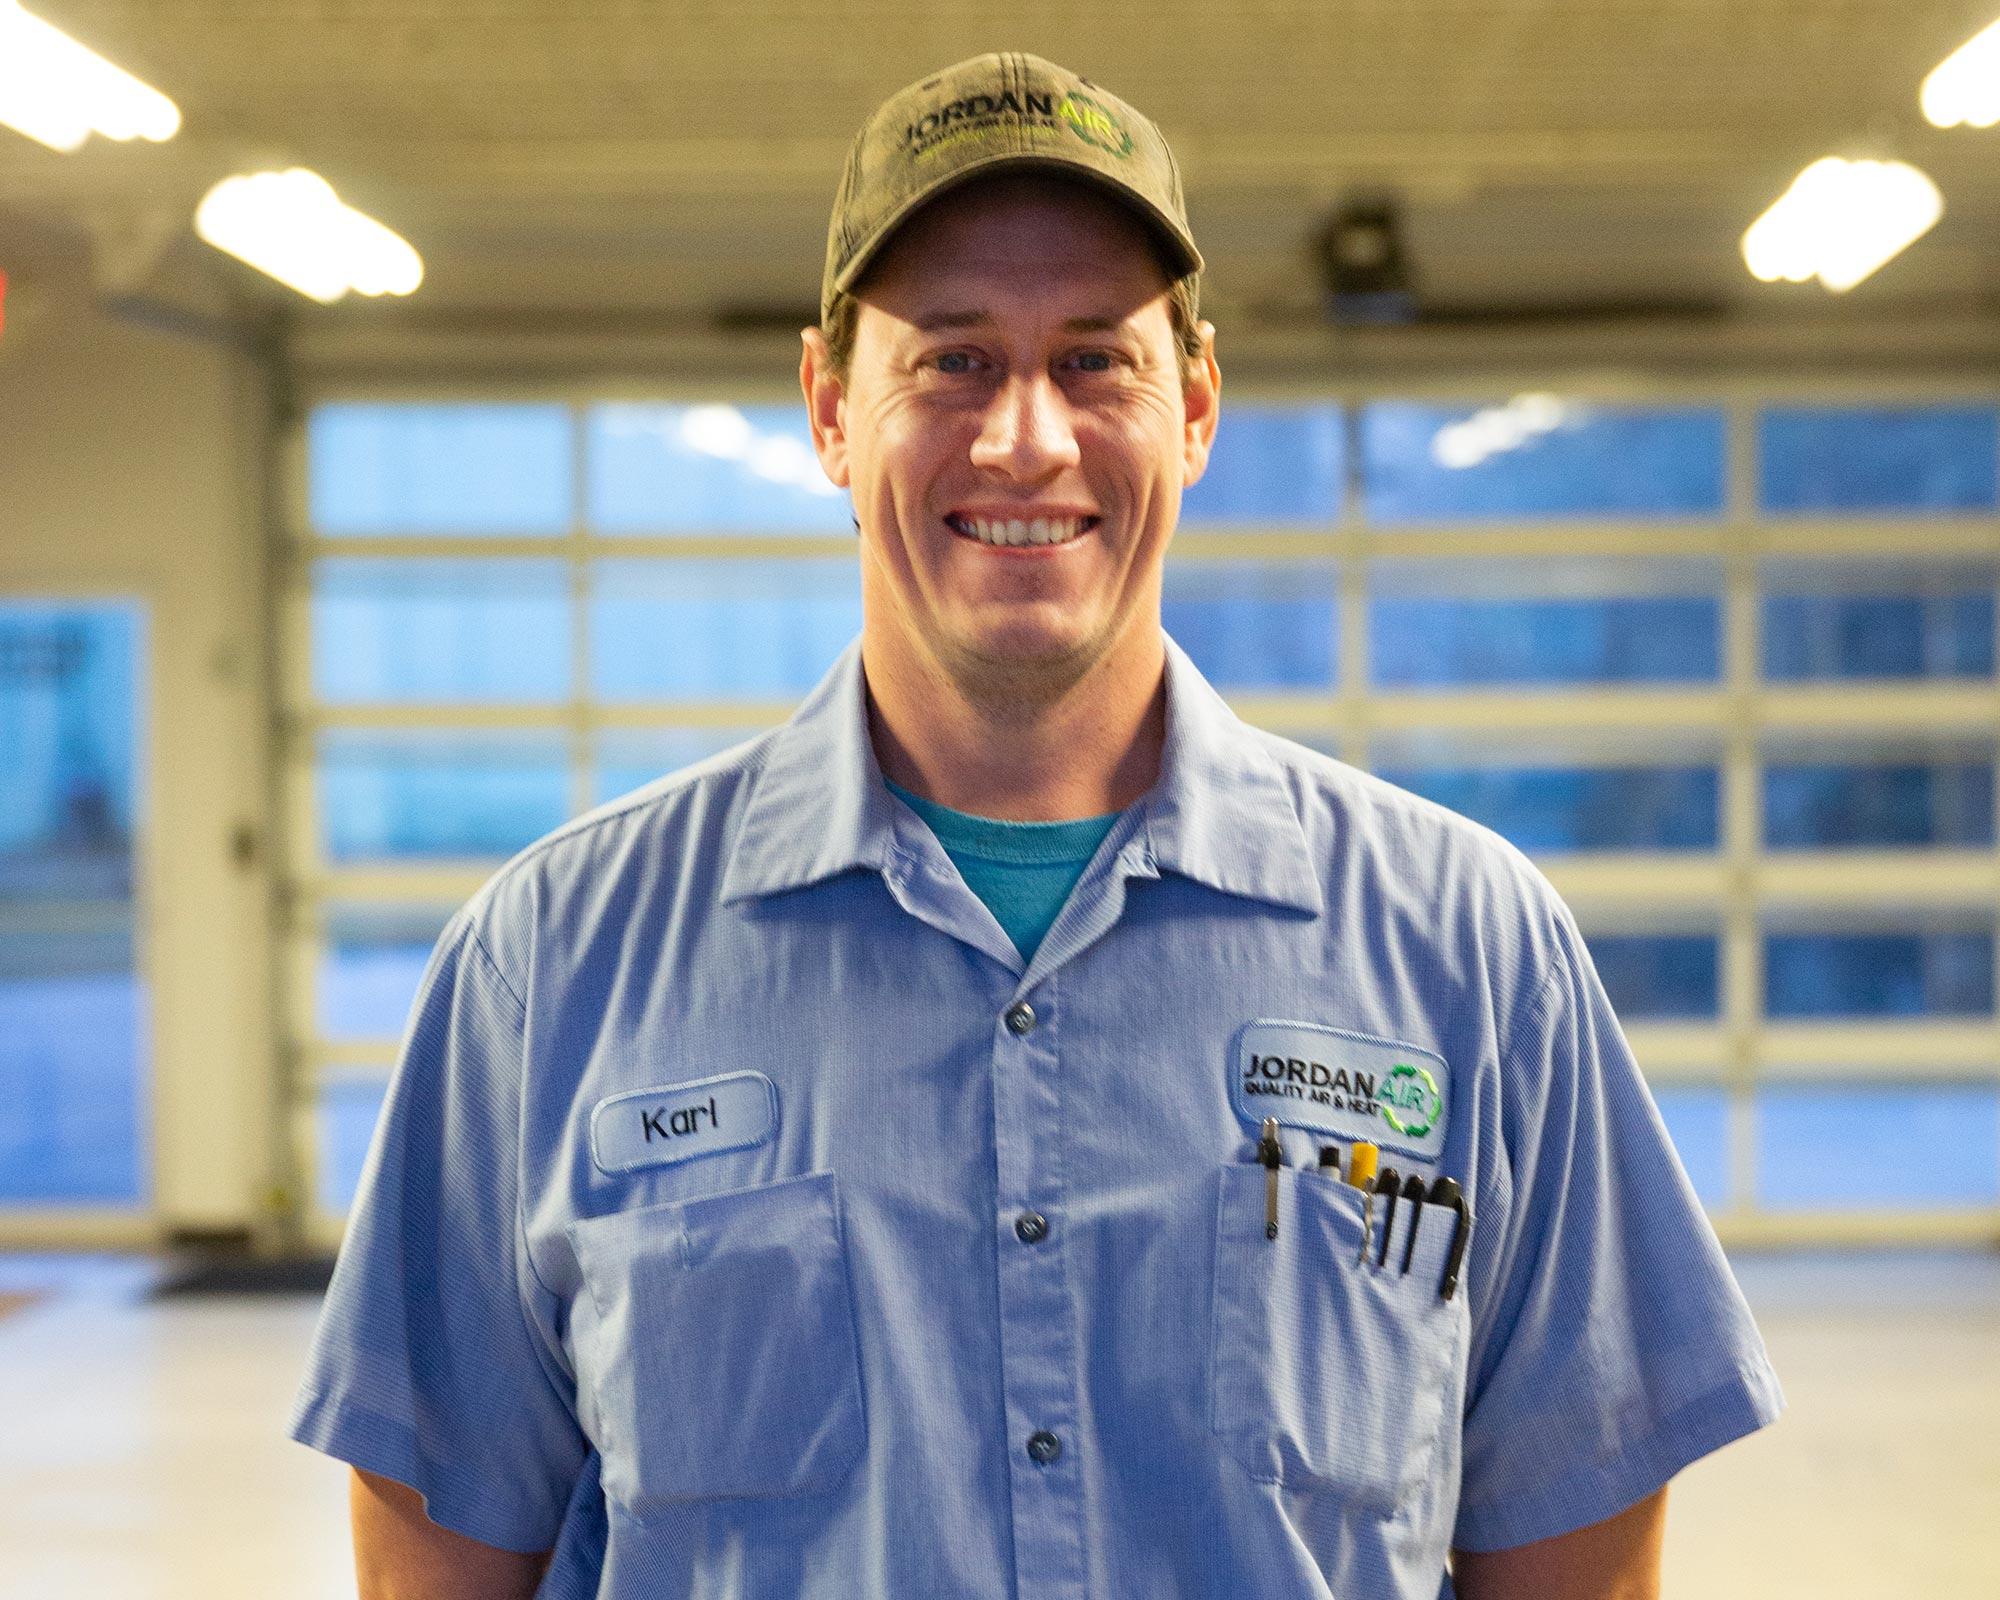 Karl-Davis-(Service-Technician)-.jpg